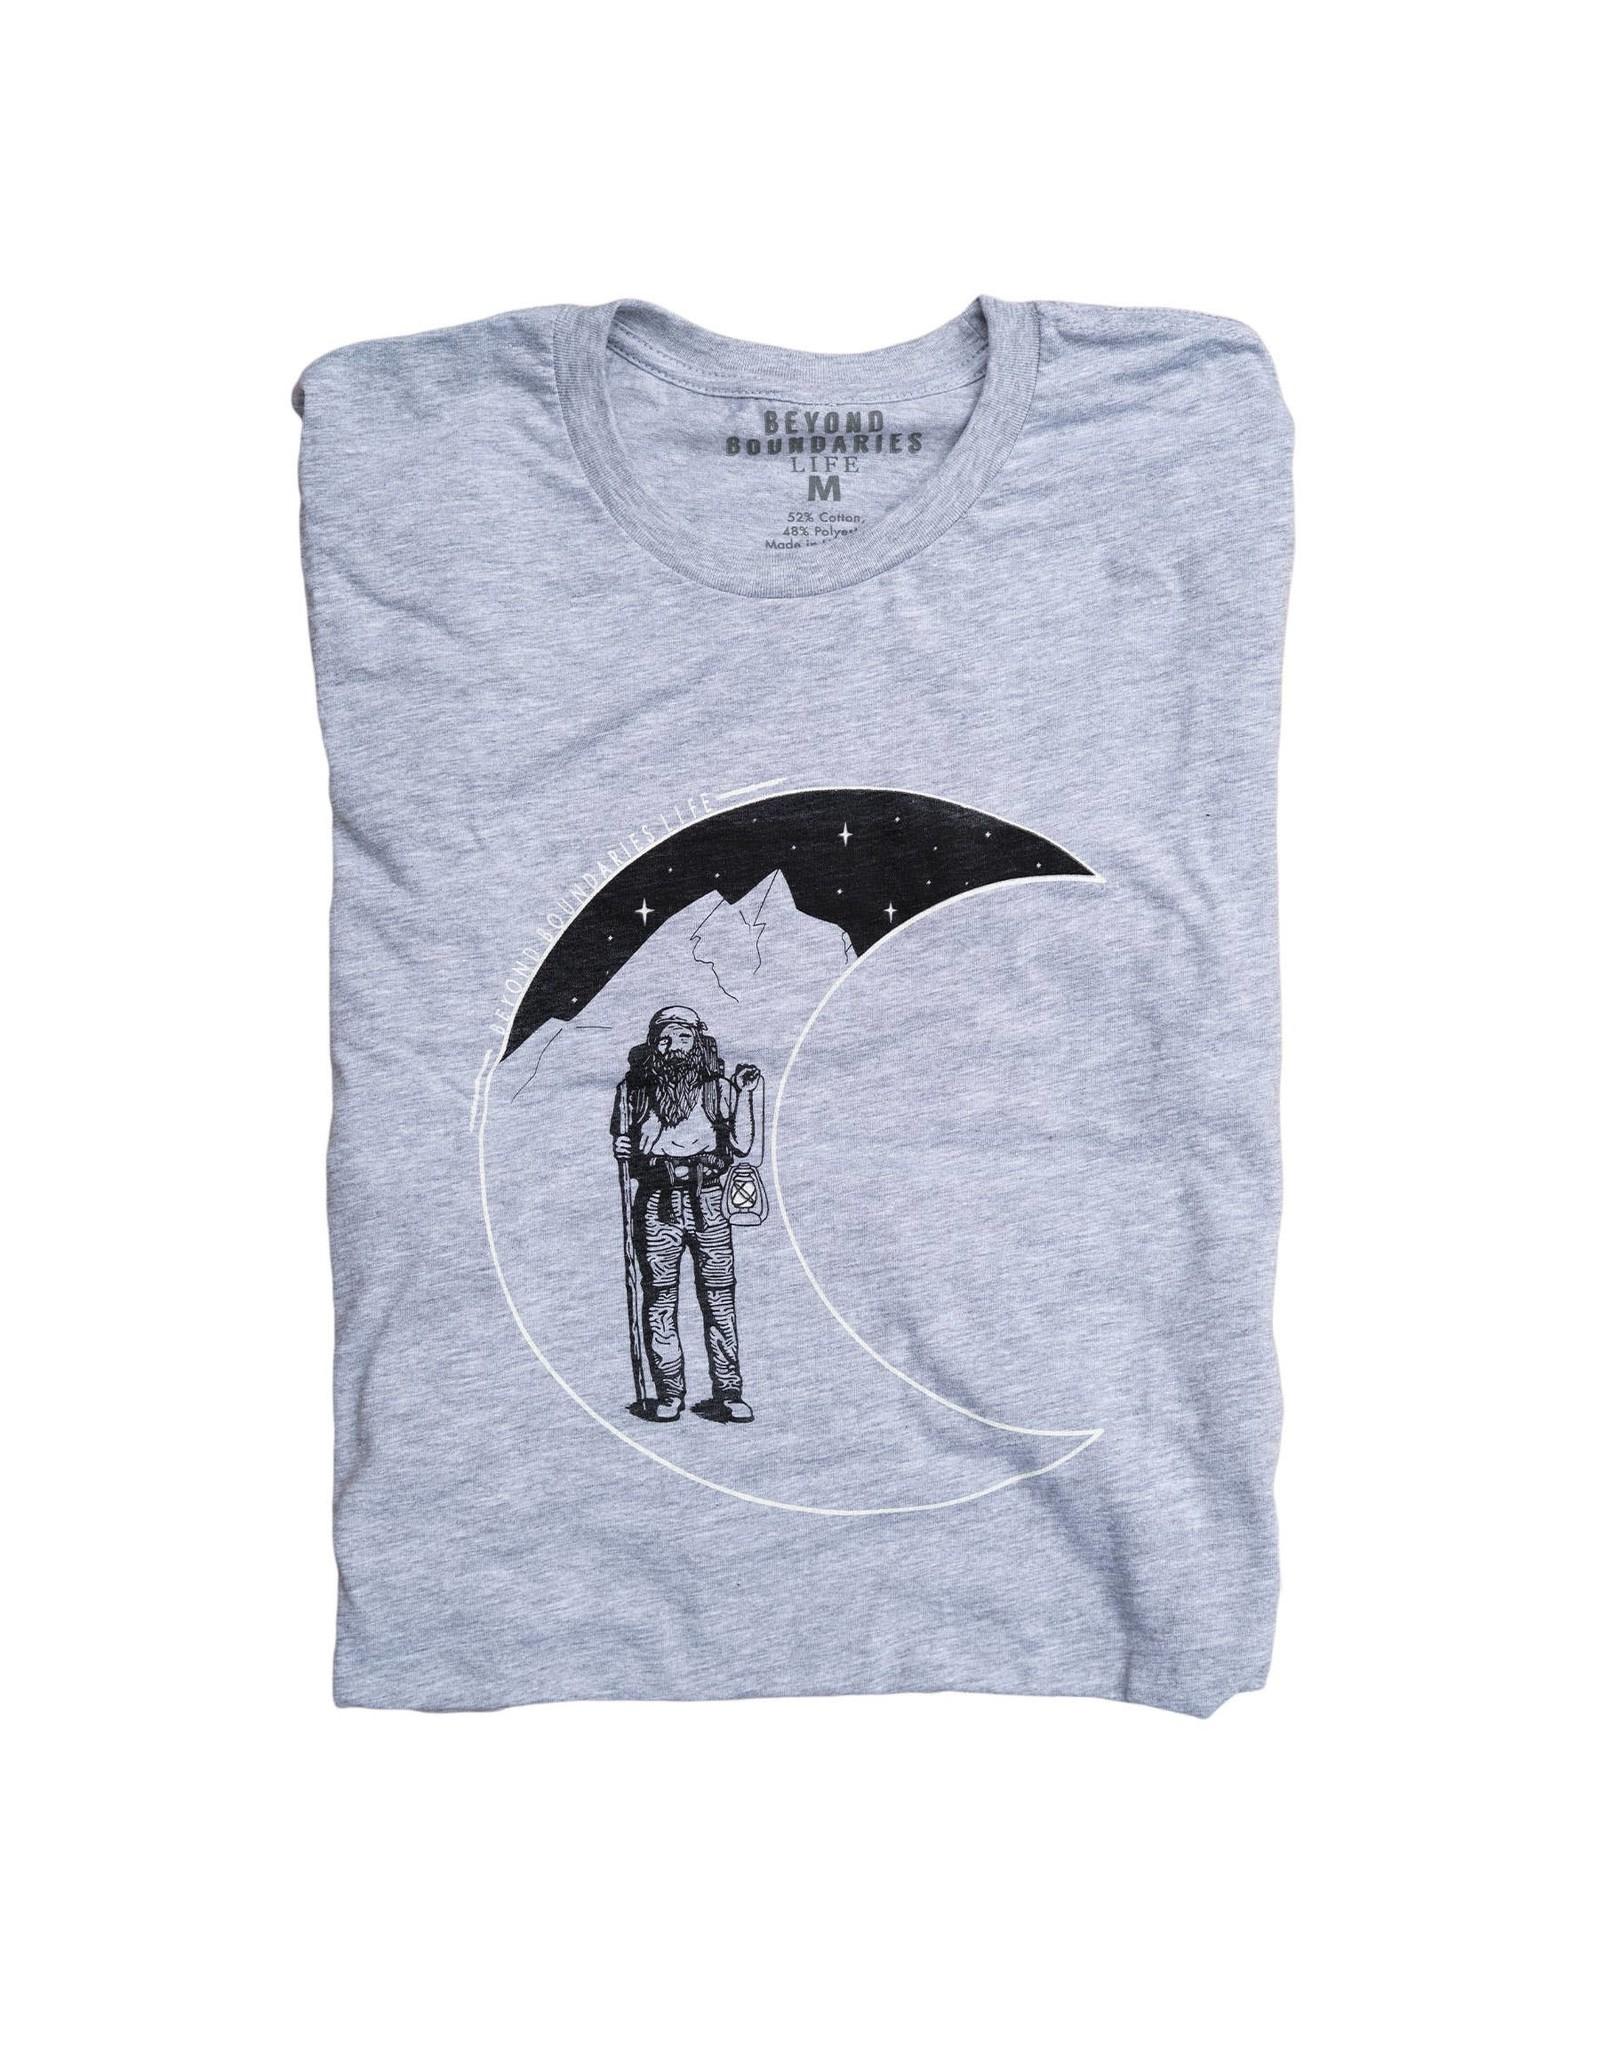 Beyond Boundaries Beyond Boundaries S/S Night Moon T-Shirt